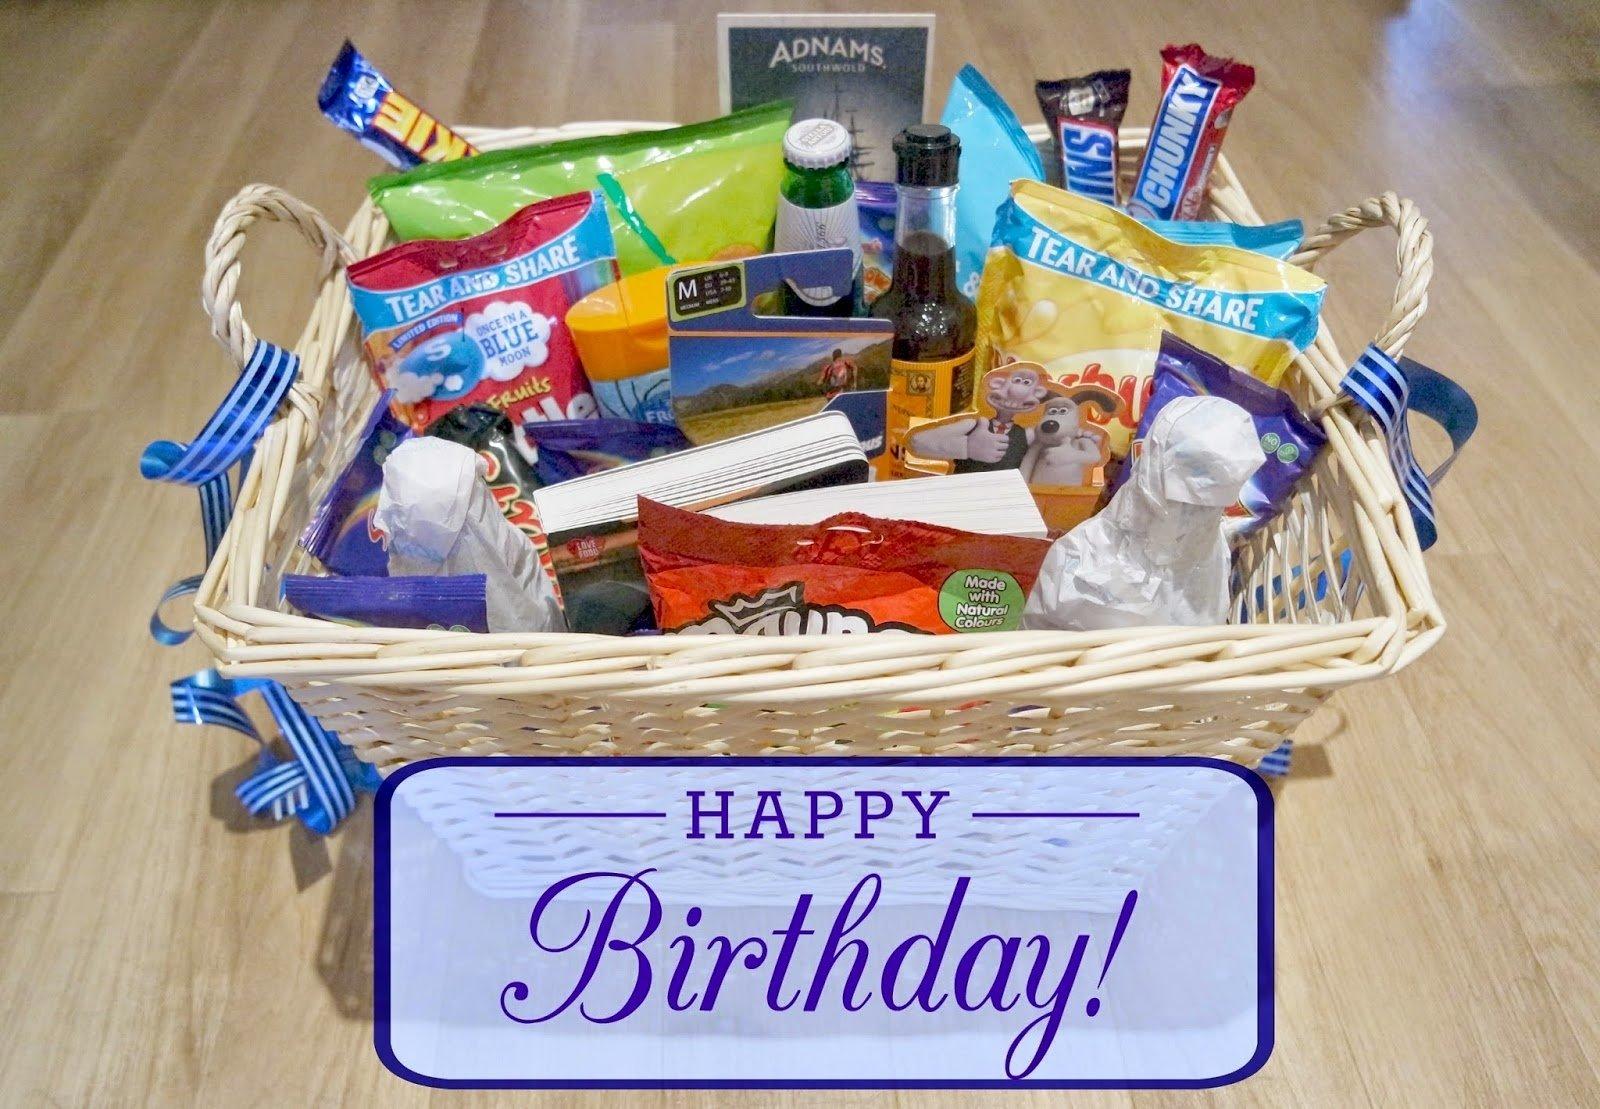 10 Stylish Gift Ideas For Dad Birthday uptown peach my dads 50th birthday hamper mens gift ideas 3